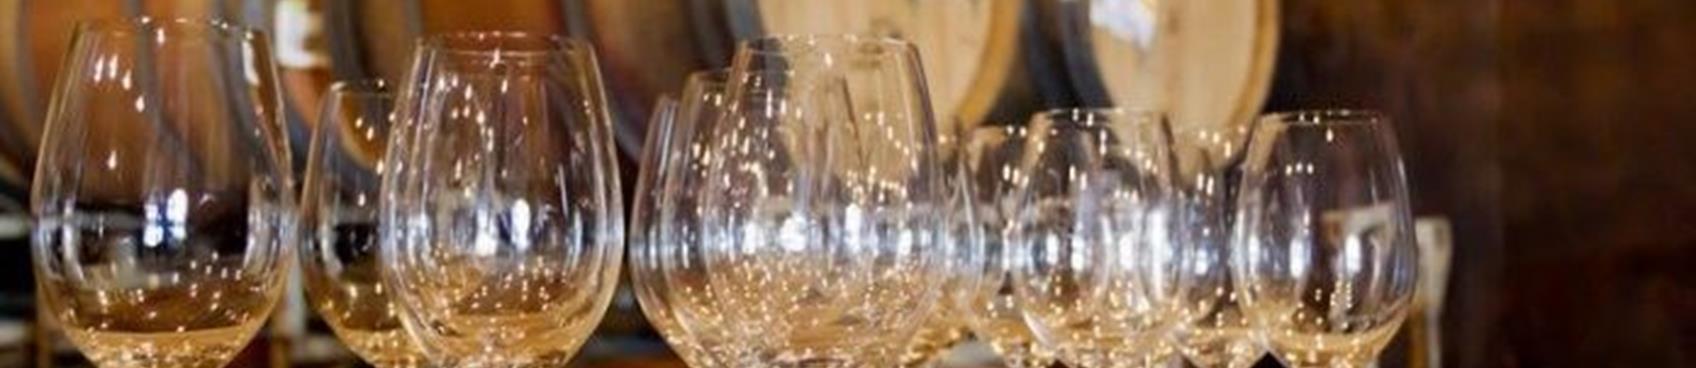 Blending Seminar with the Winemaker